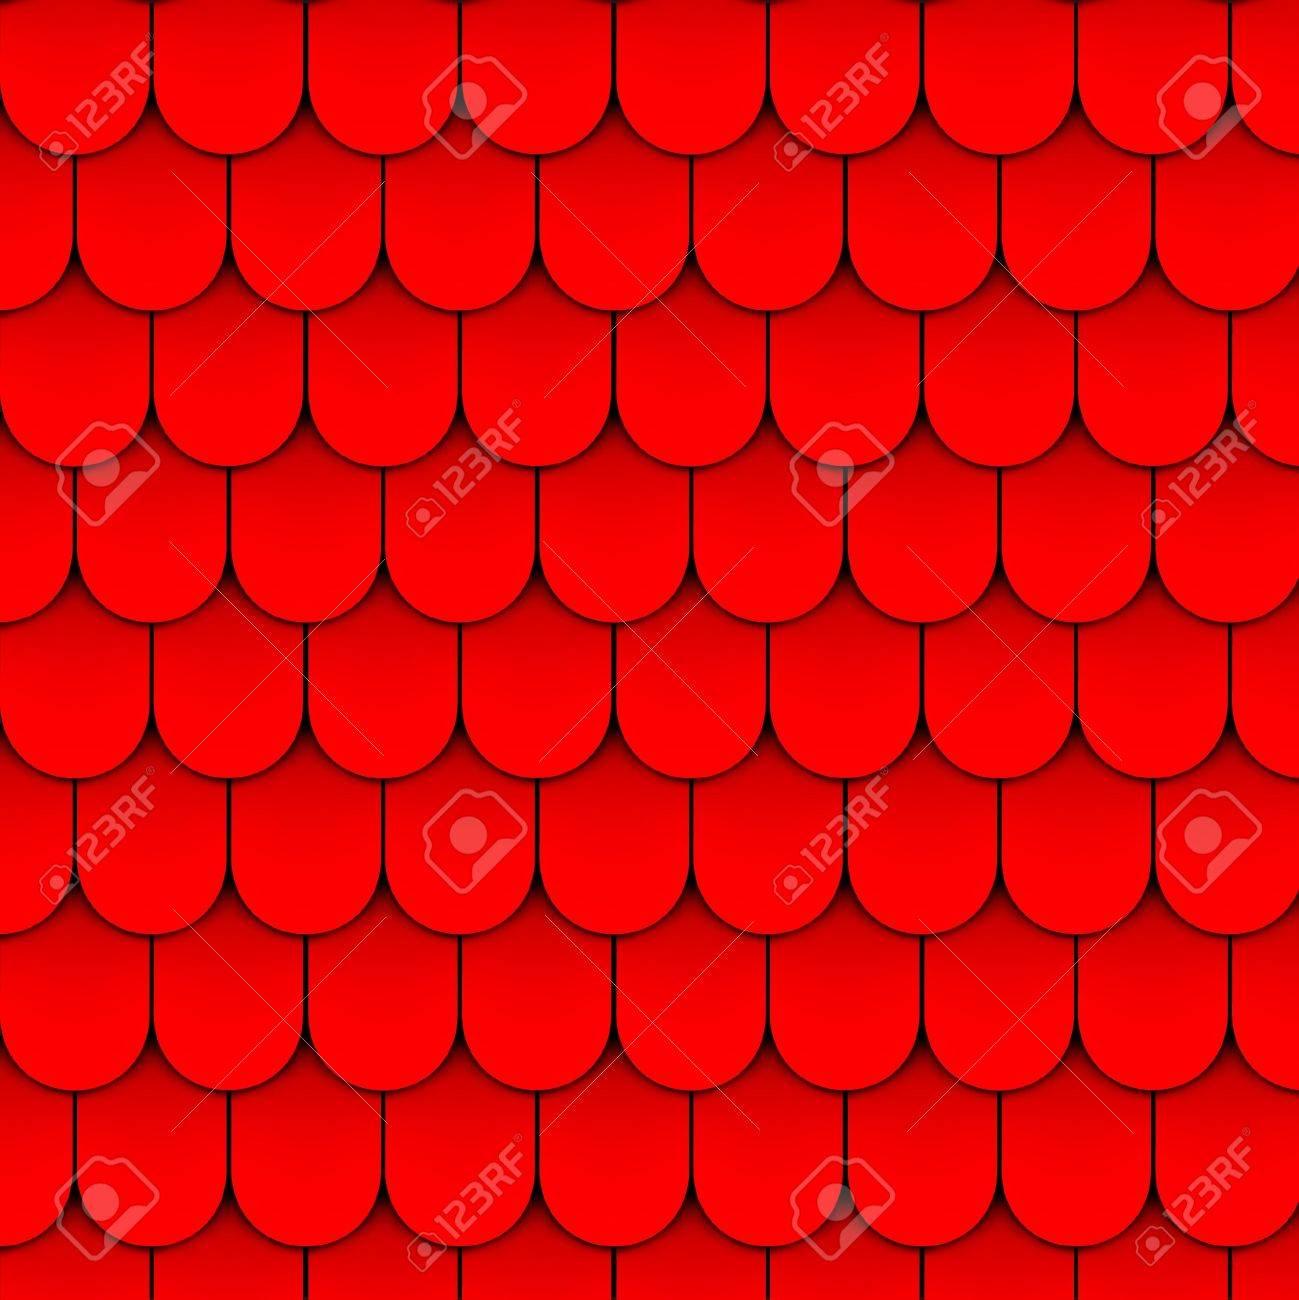 Ardoise rouge